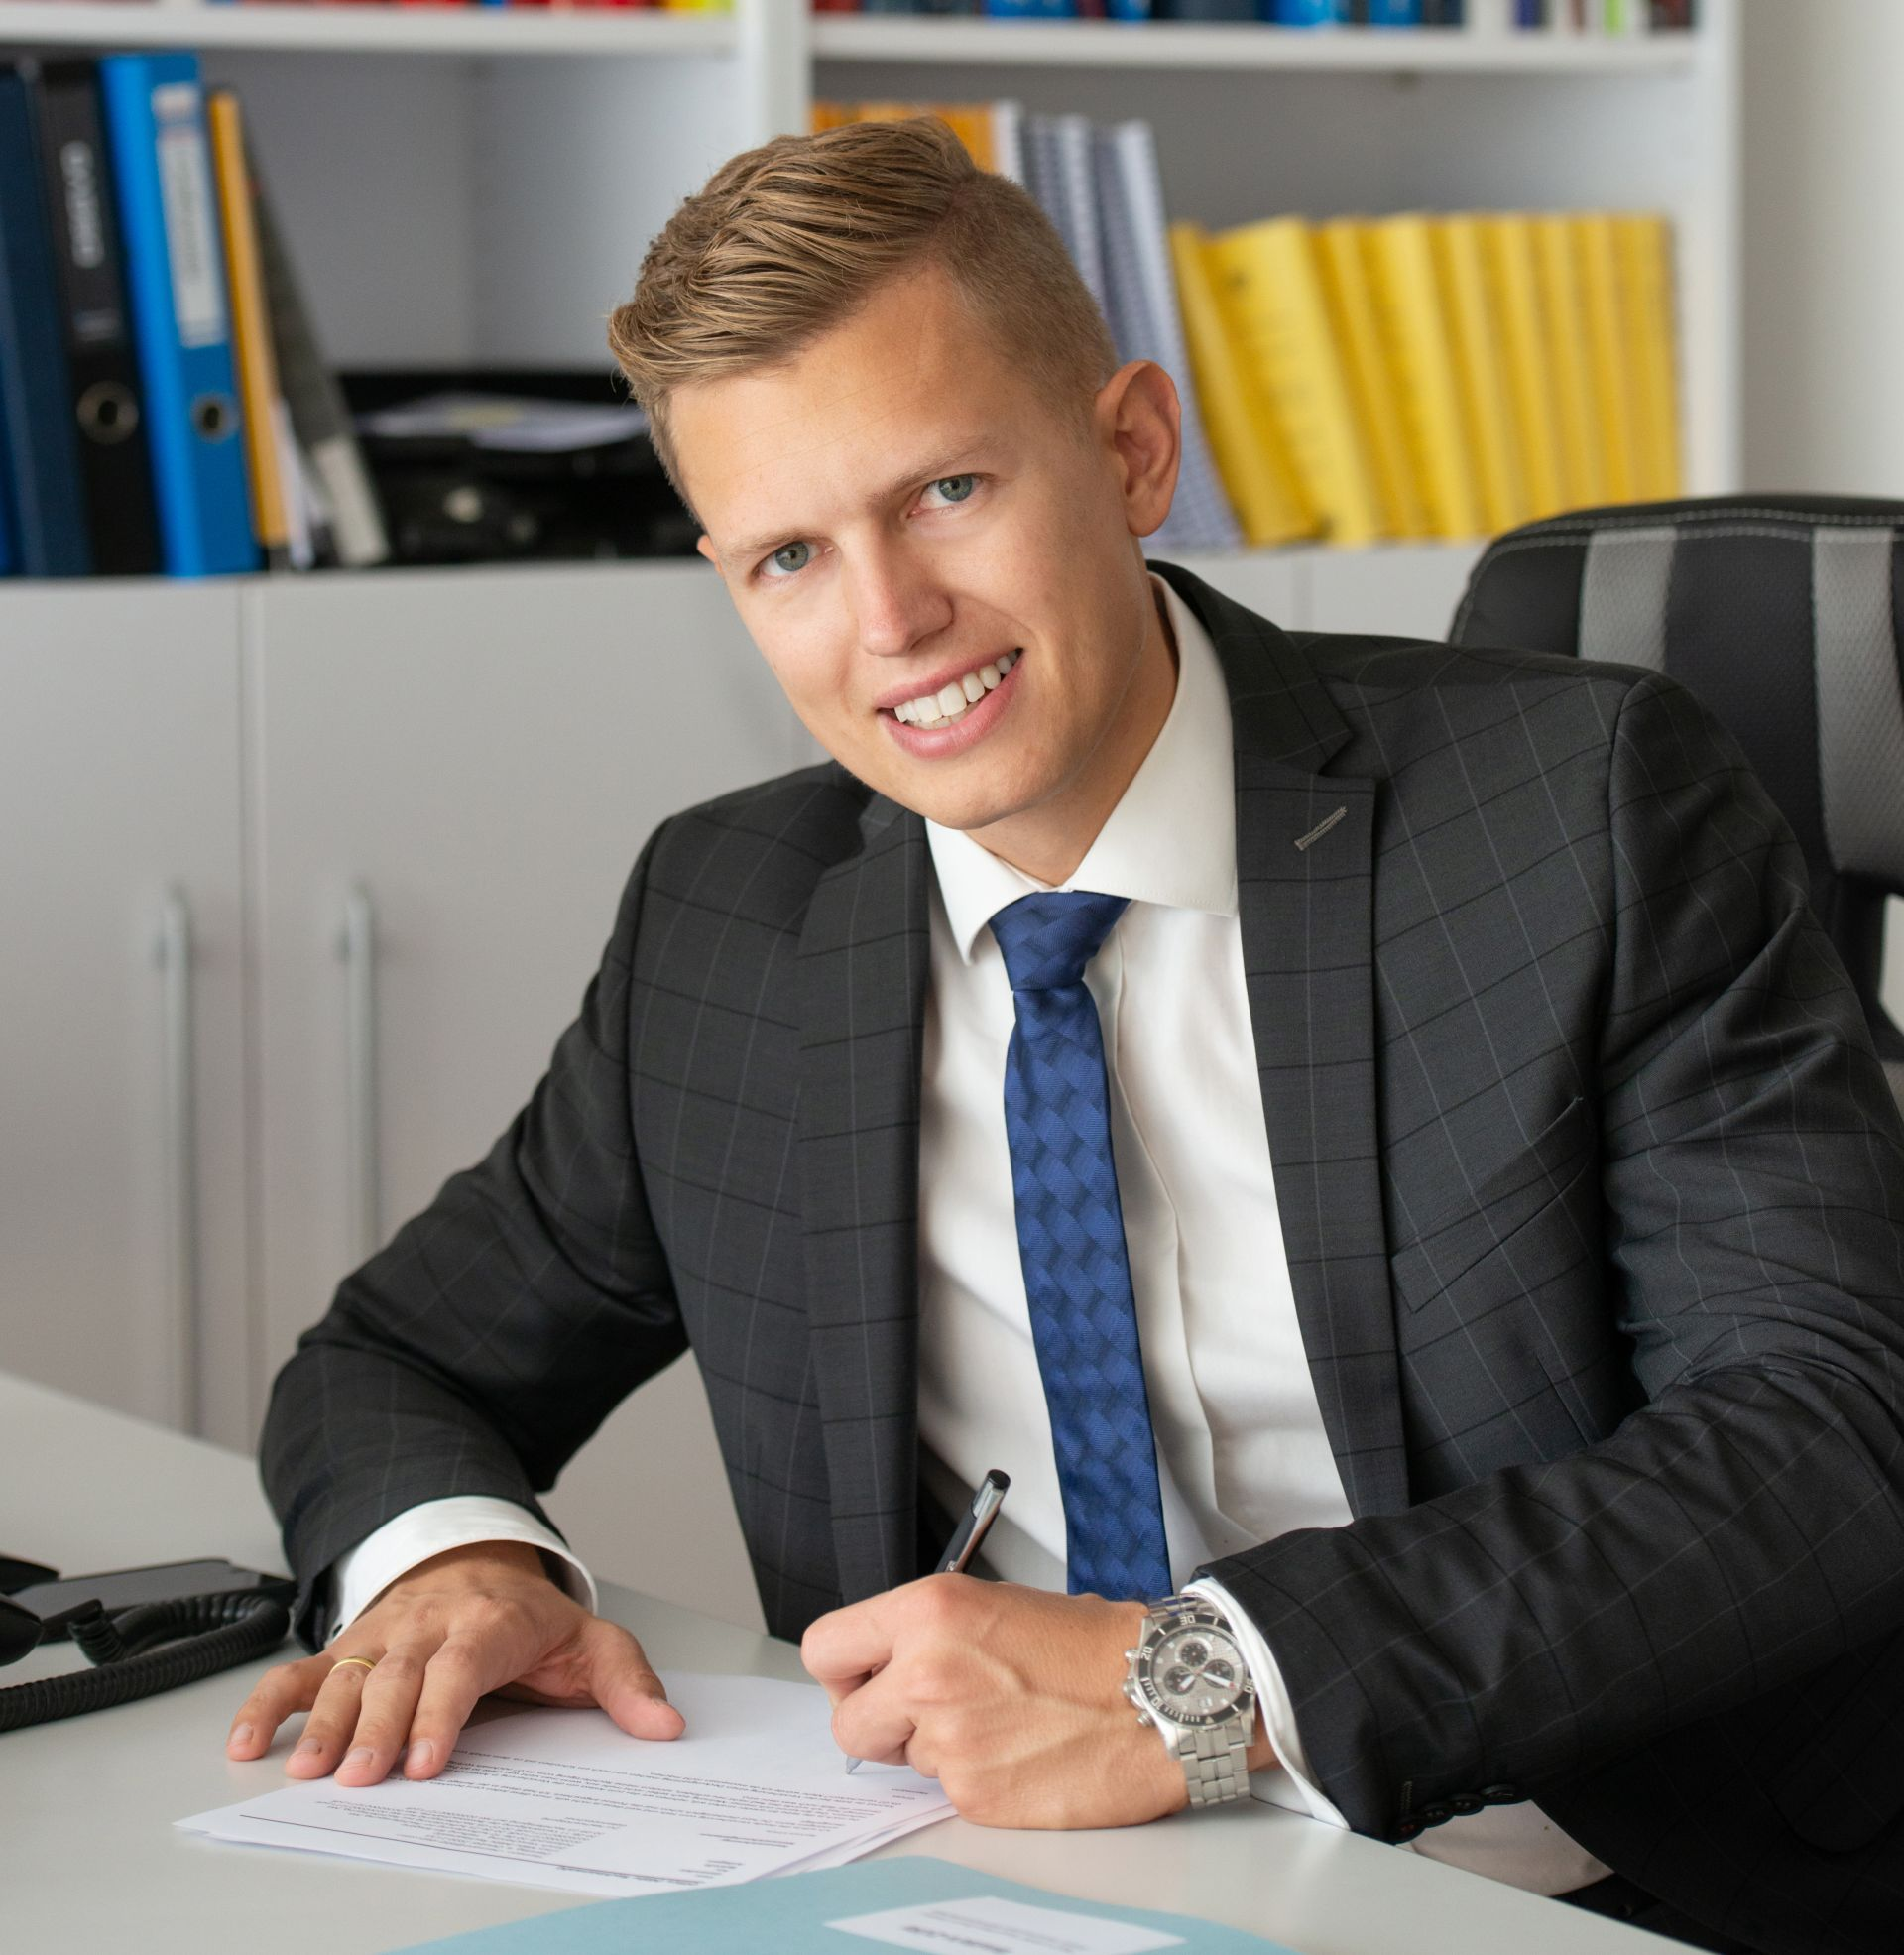 MMag. Dr. Linus Mähr